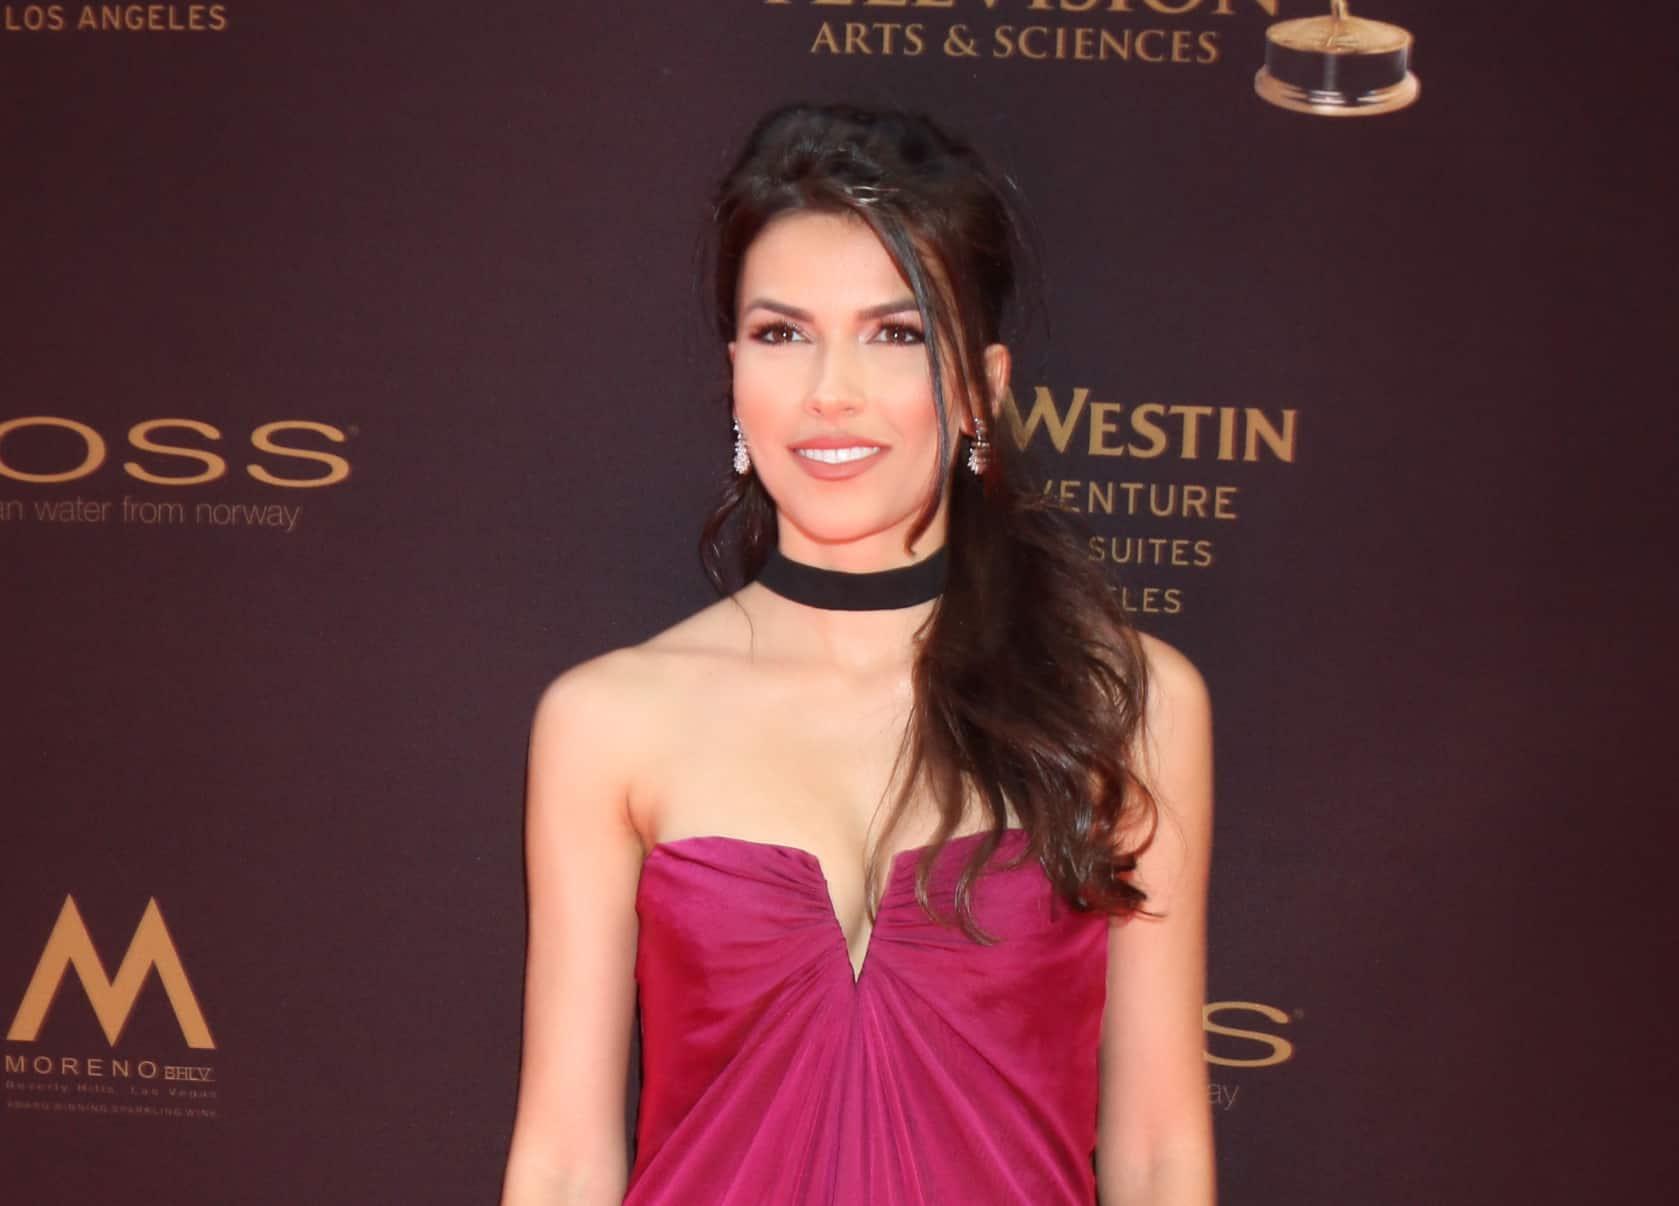 Actress Sofia Pernas